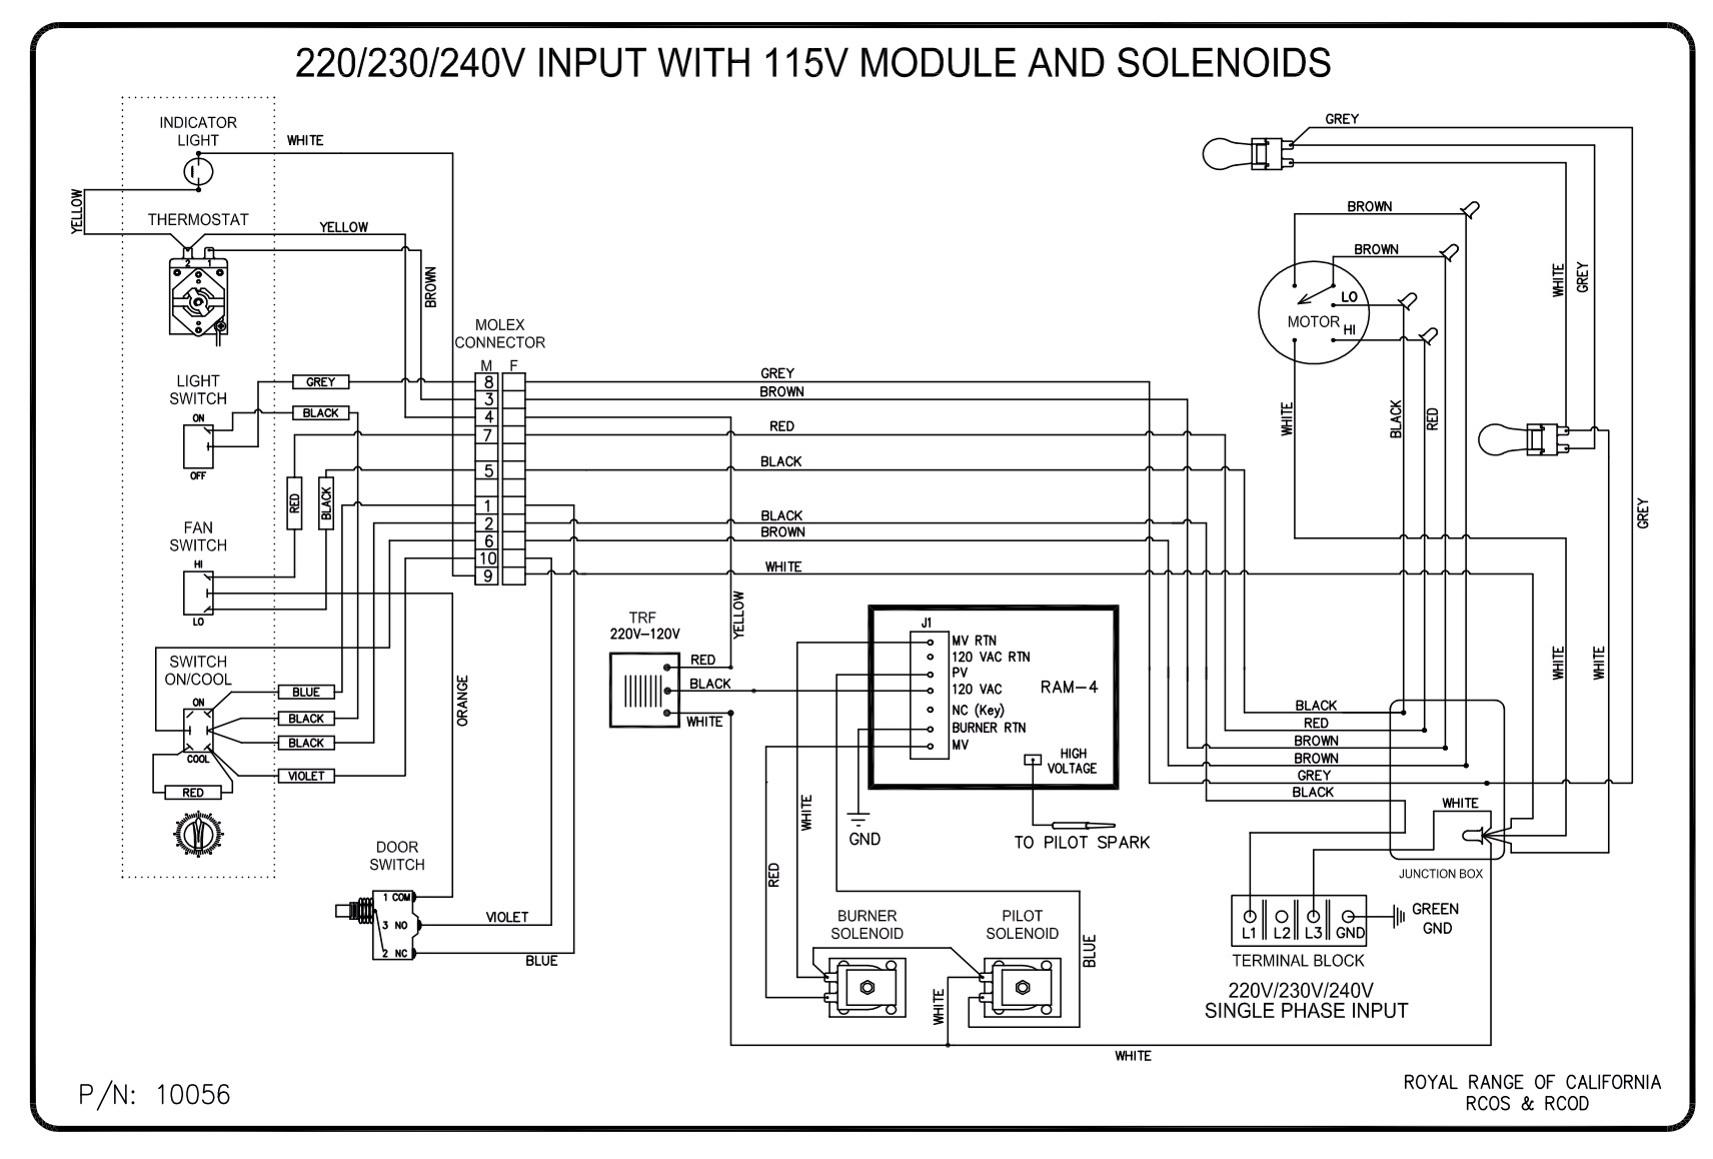 Oven Wiring Diagram - Data Wiring Diagram Today - Wiring Diagram